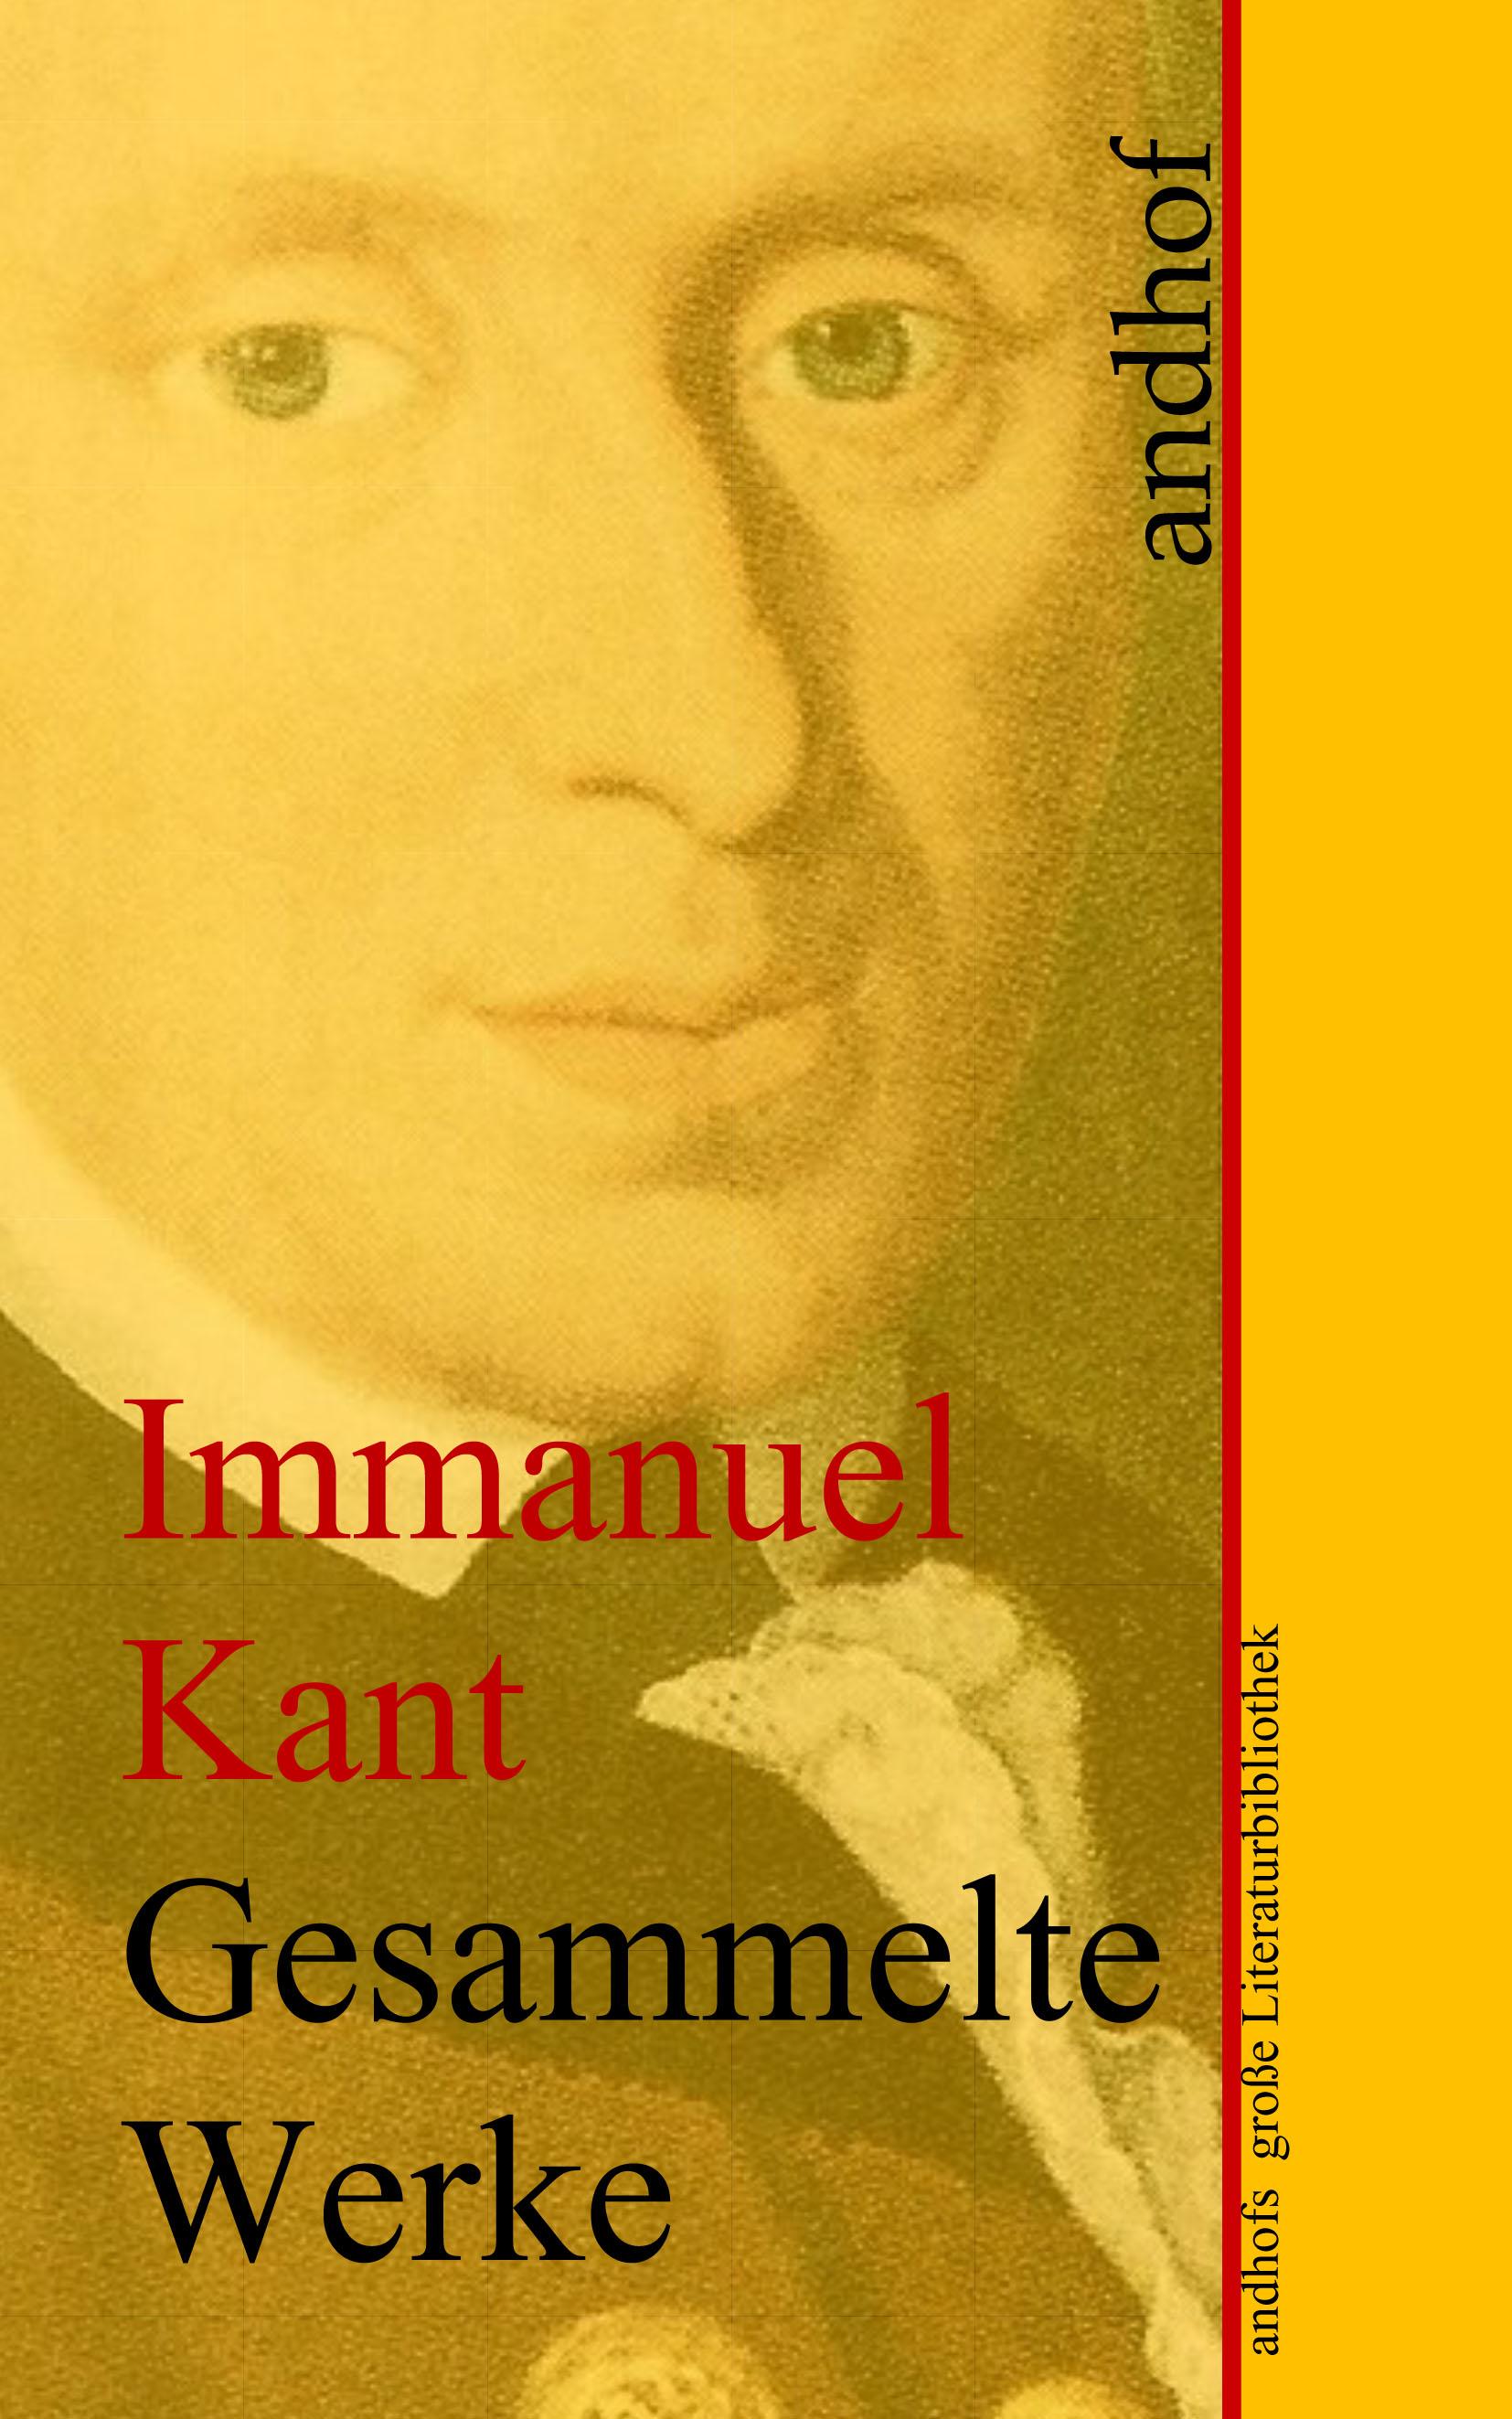 цена на Immanuel Kant Immanuel Kant: Gesammelte Werke